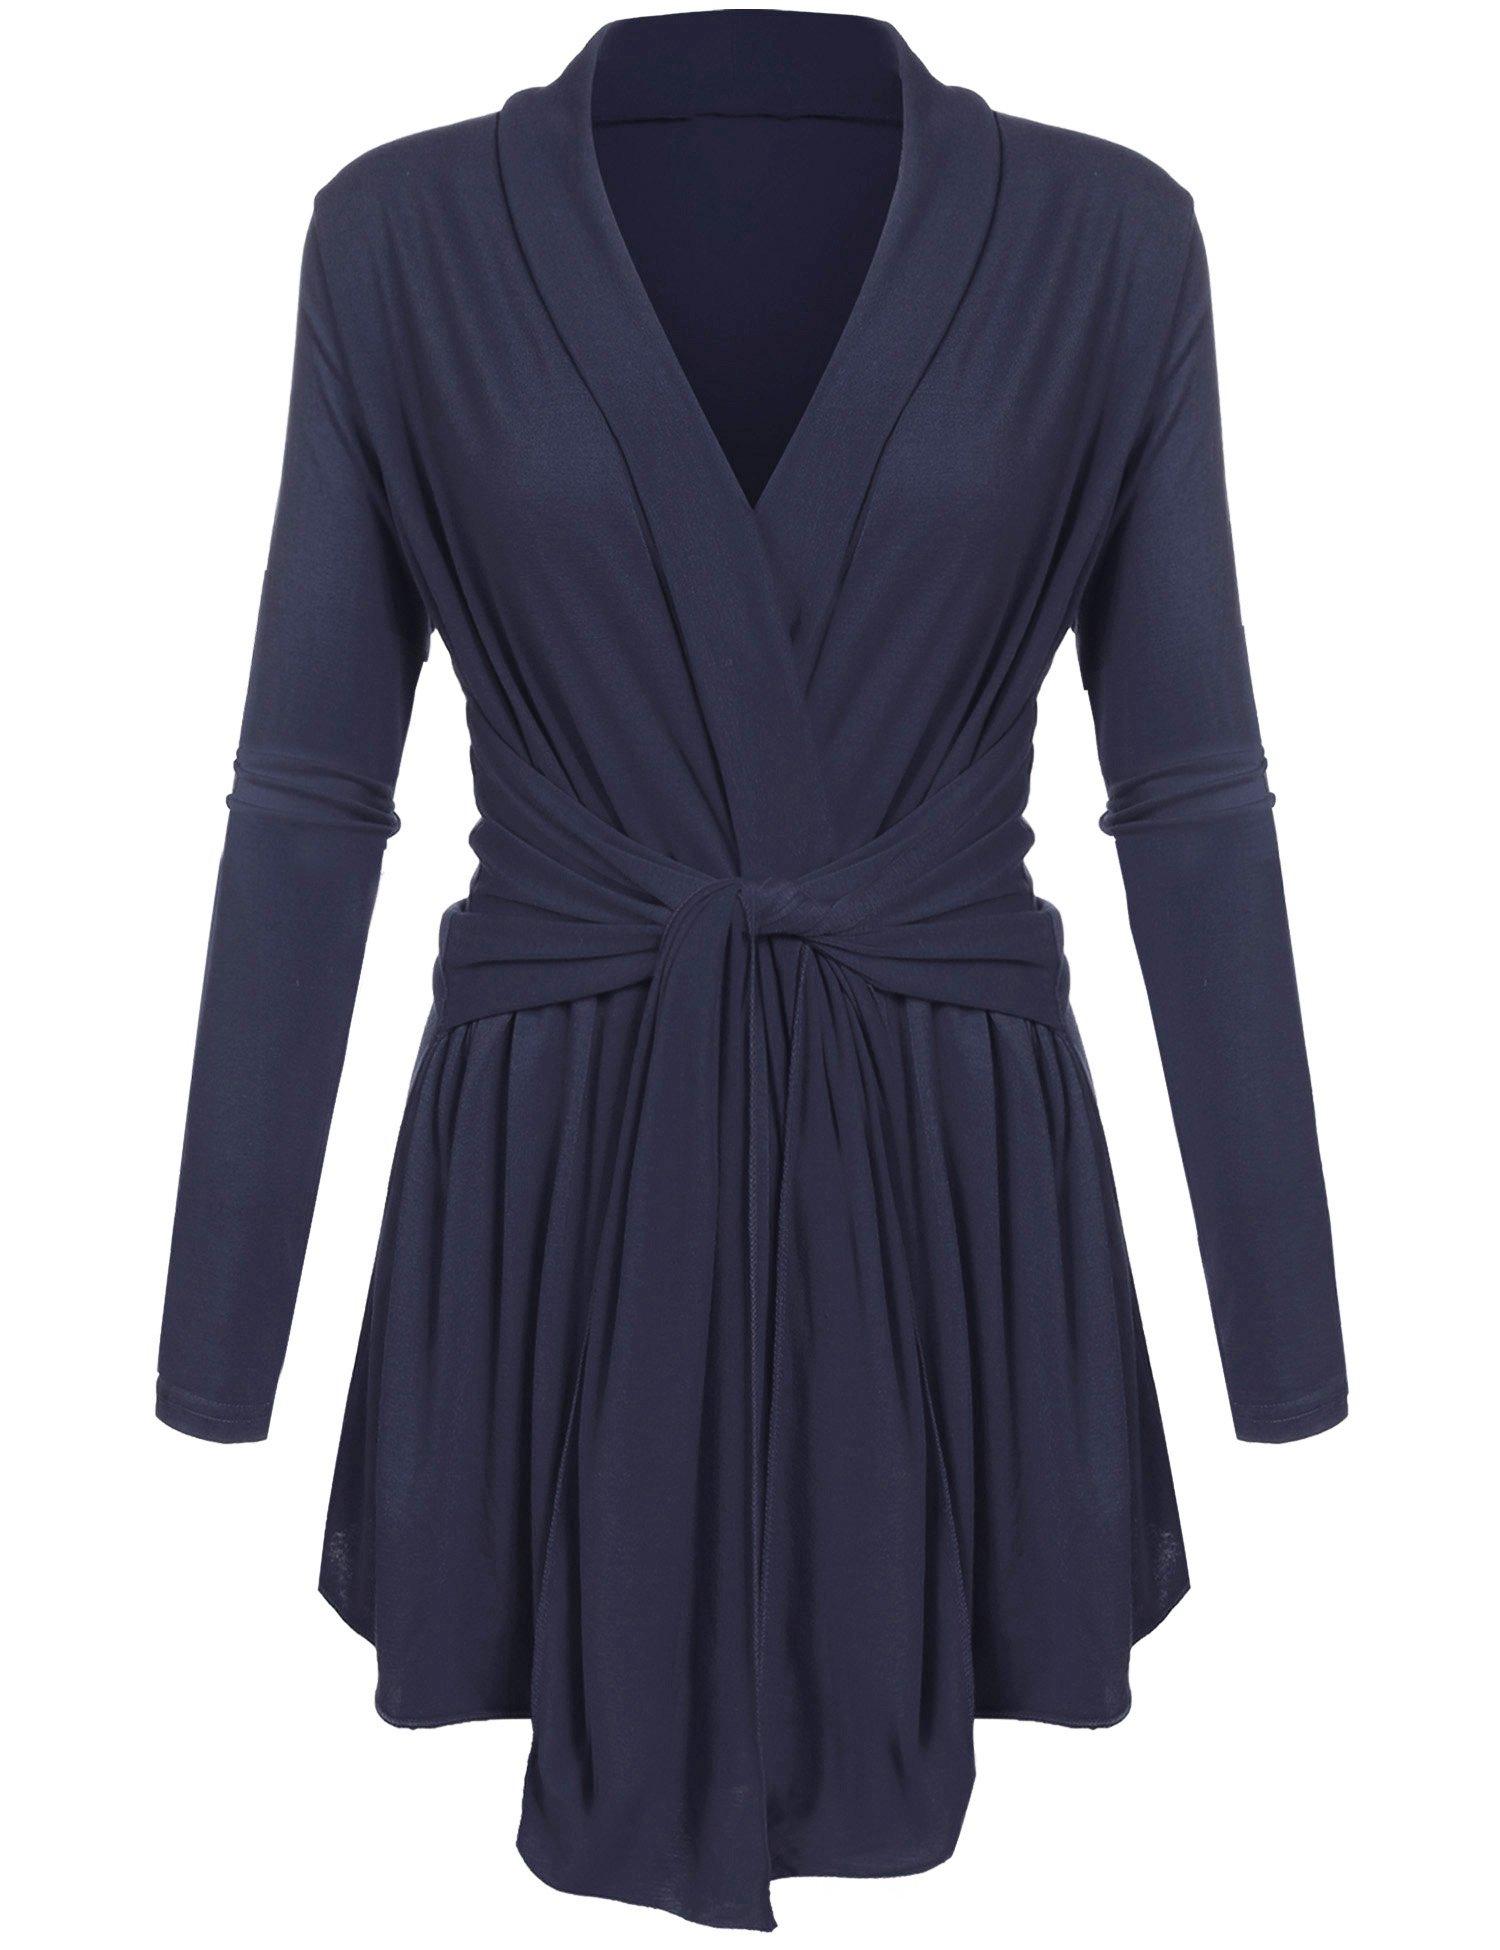 Beyove Women's Long Sleeve Travel Lightweight Cardigan Drape Soft Knit Open Front Cardigan Sweater Plus Size